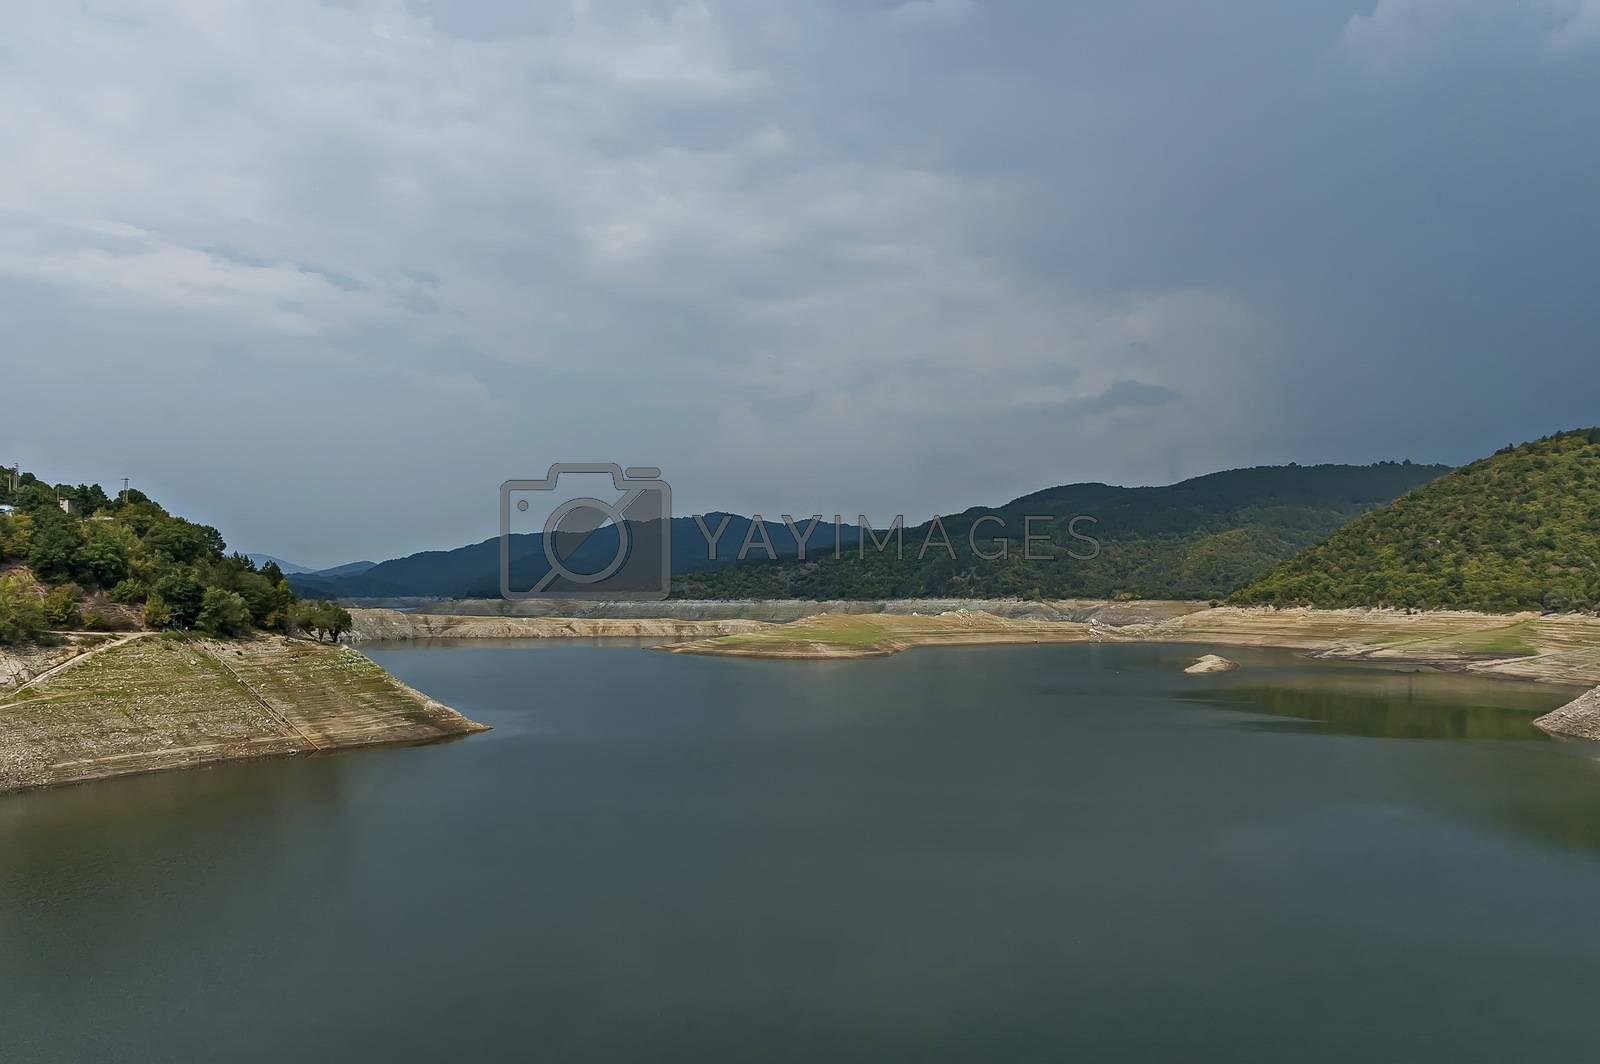 View of the Topolnitsa dam, reservoir, lake or barrage on the river Topolnitsa near village Muhovo, Ihtiman region, Bulgaria, Europe